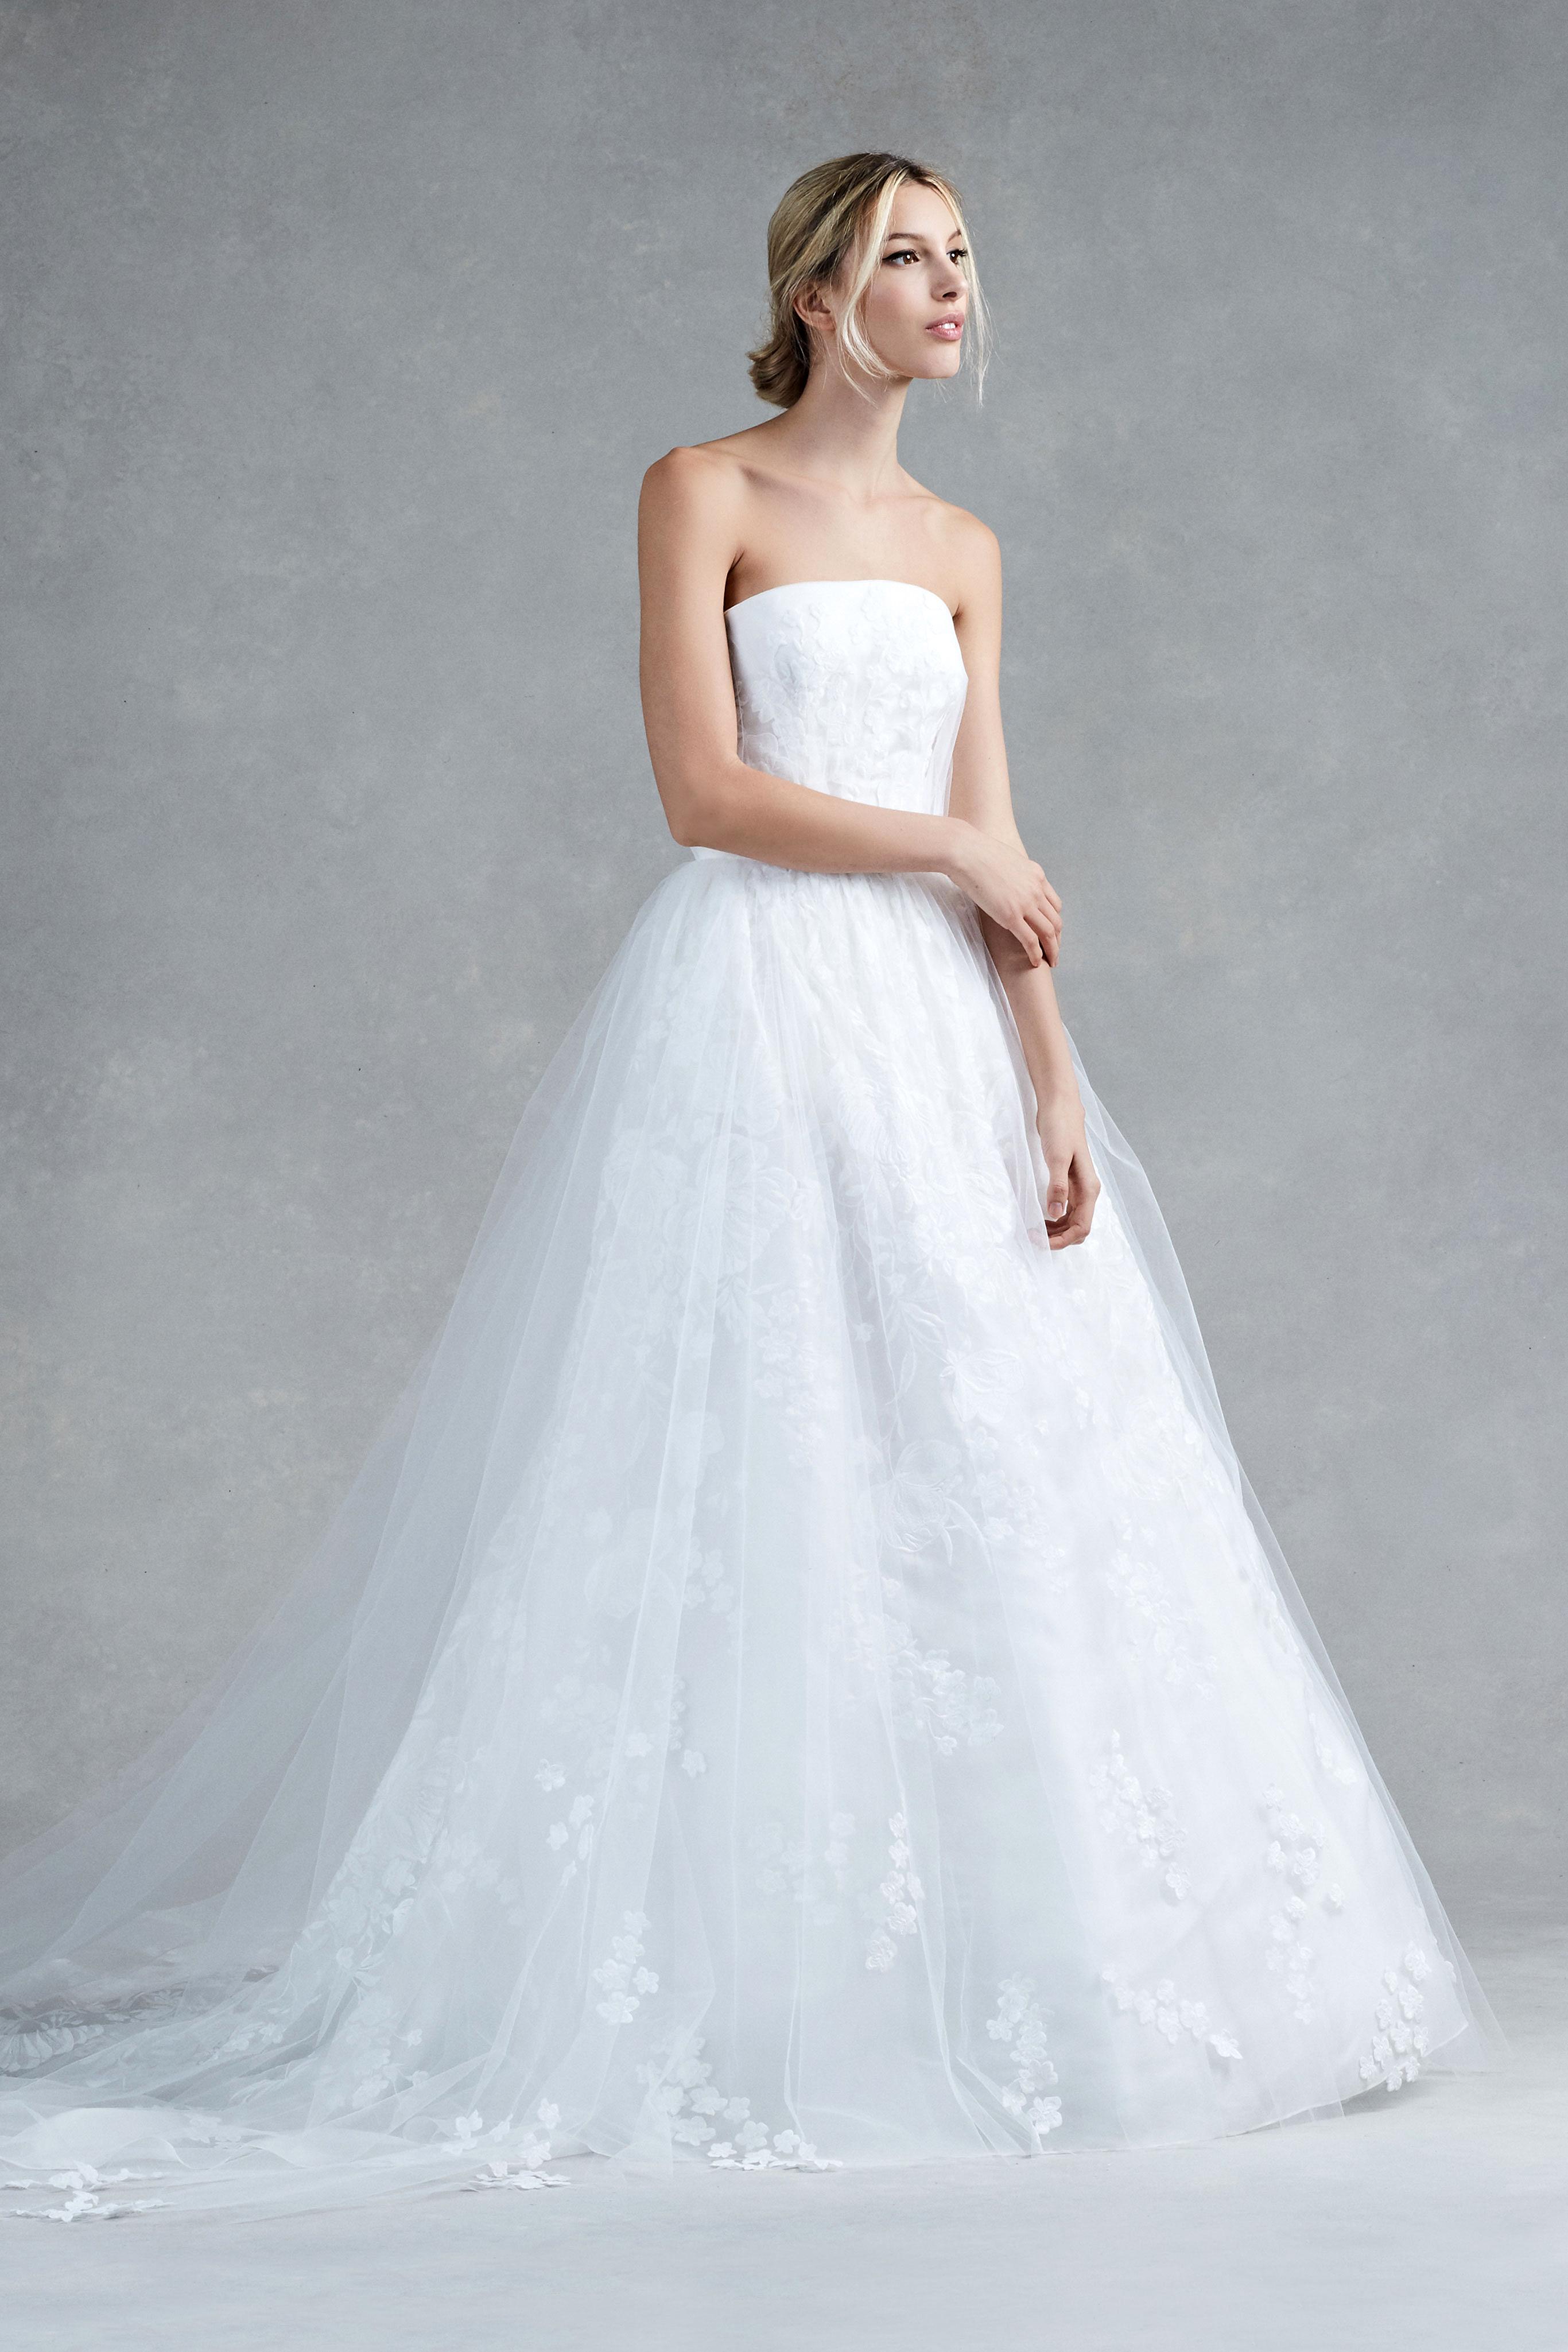 Oscar de la Renta Fall 2017 Wedding Dress Collection